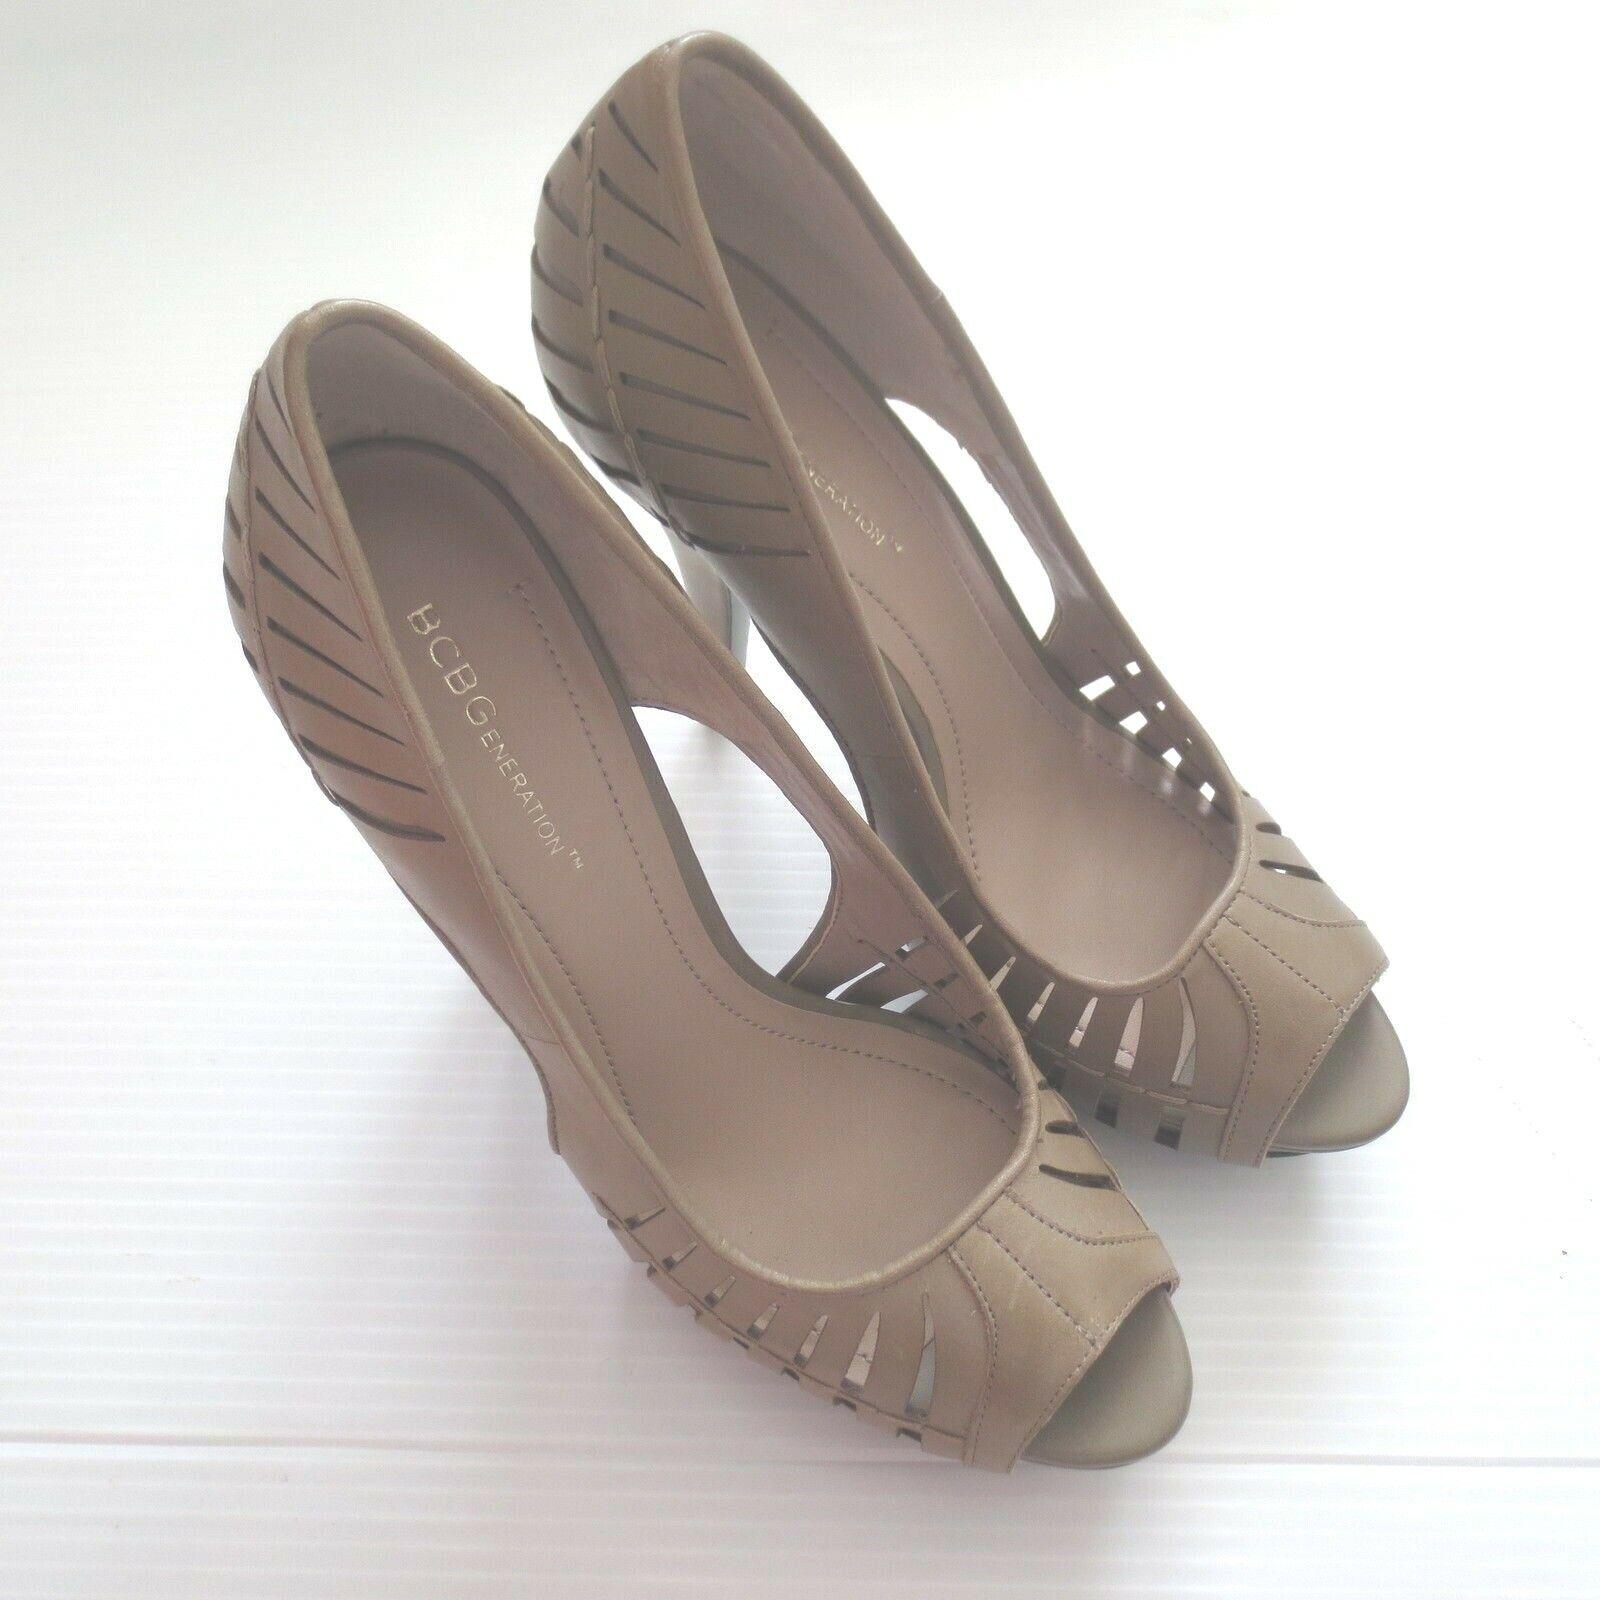 BCBGeneration BG-Evie Leather schuhe - Farbe Khaki - Größe 10B 40 - NEW